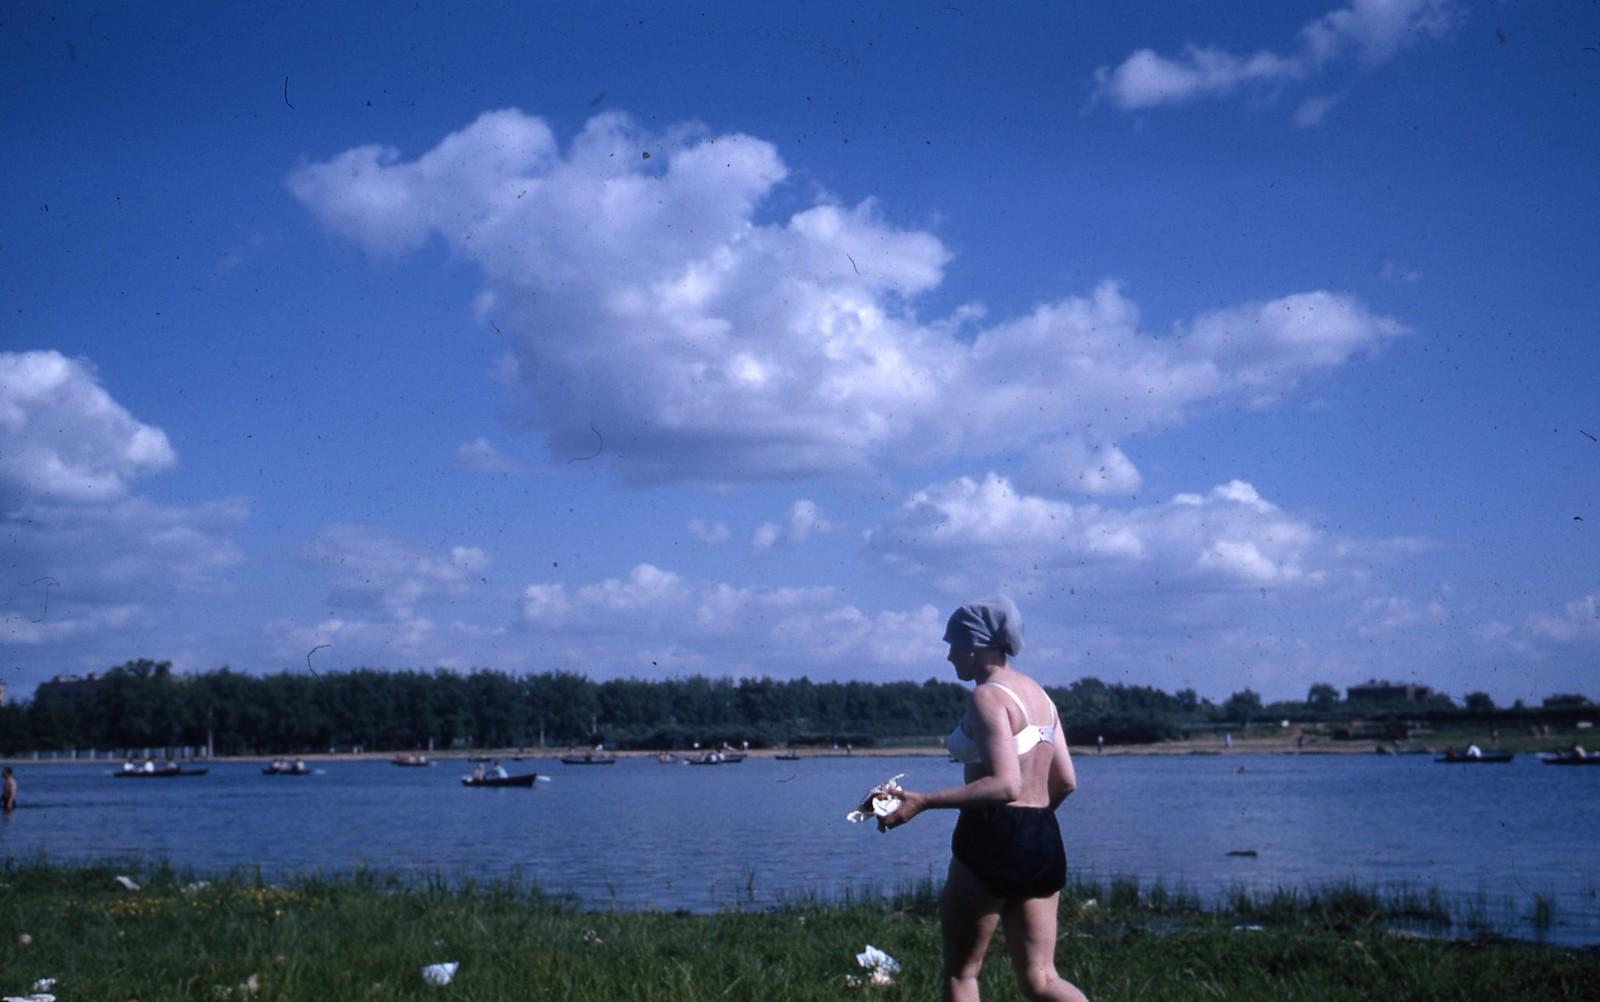 hammond-MA10-Ostankino-people-sunbathing-and-fishing-023